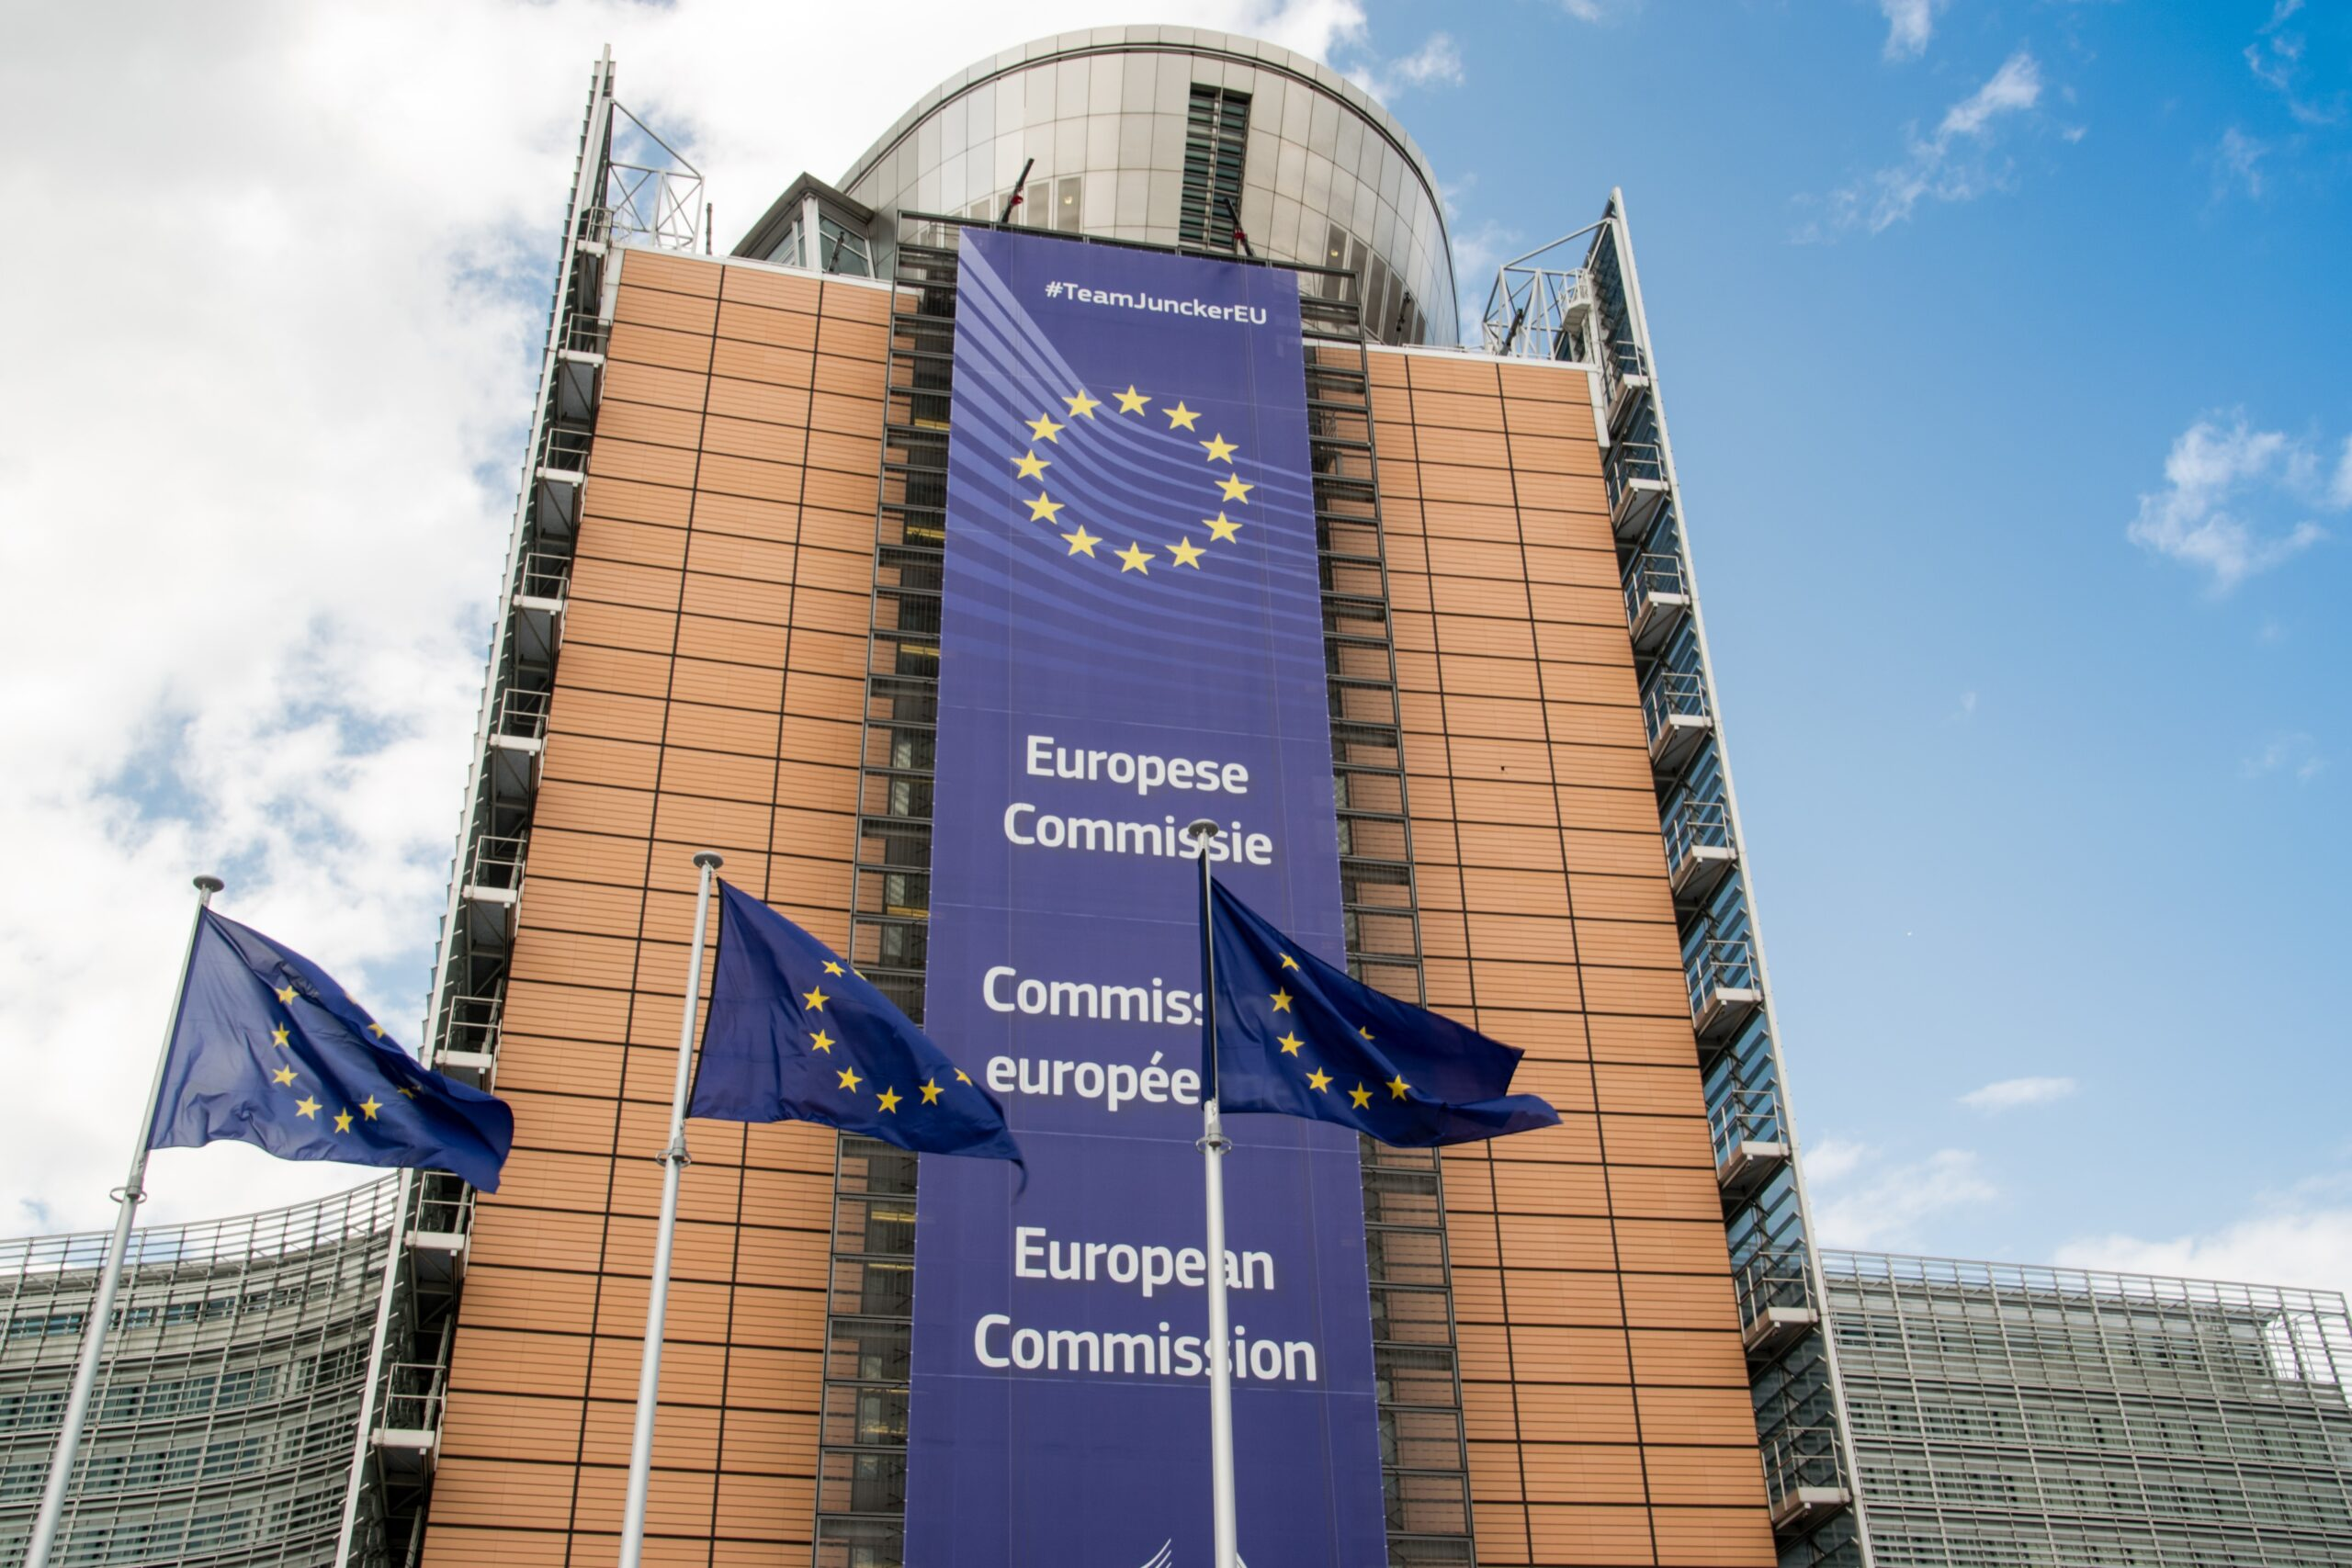 EU、ガソリン車販売2035年に禁止。国境炭素税23年にも、日本に逆風